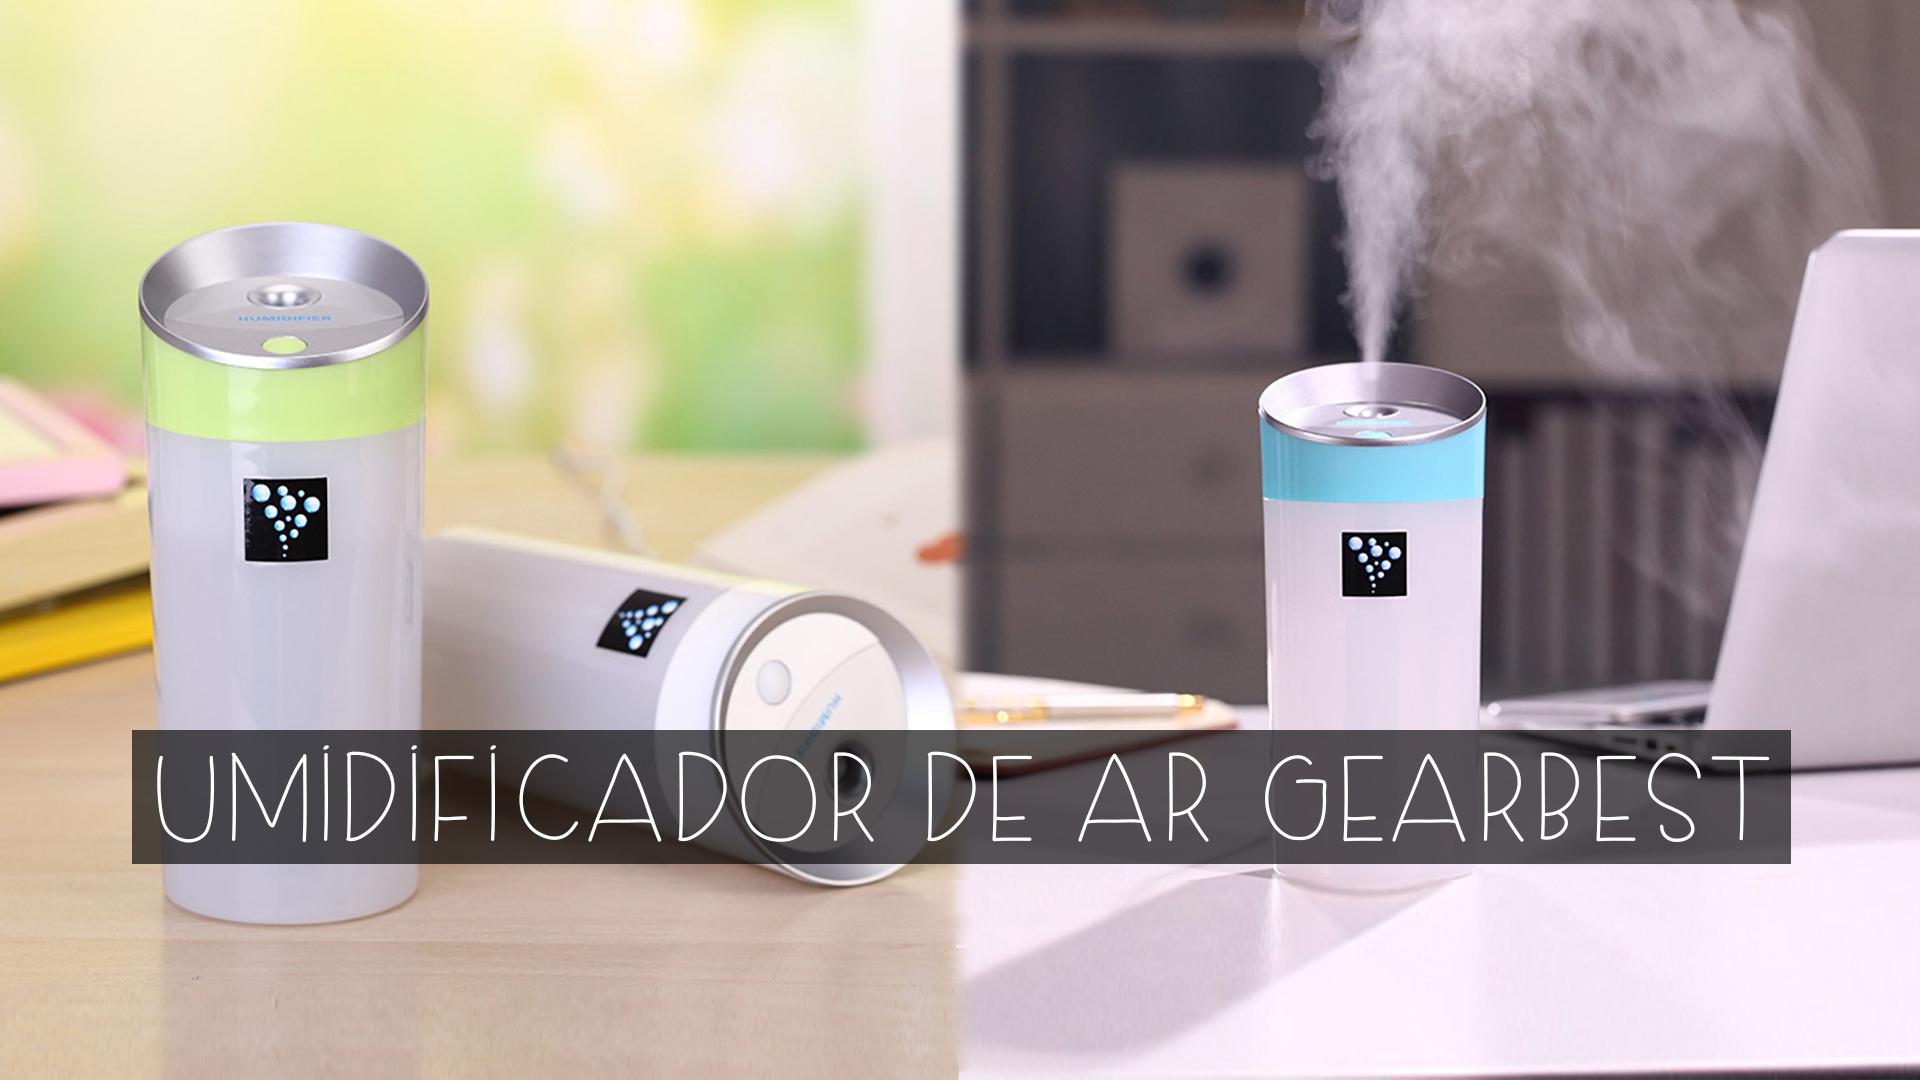 umidificador de ar gearbest